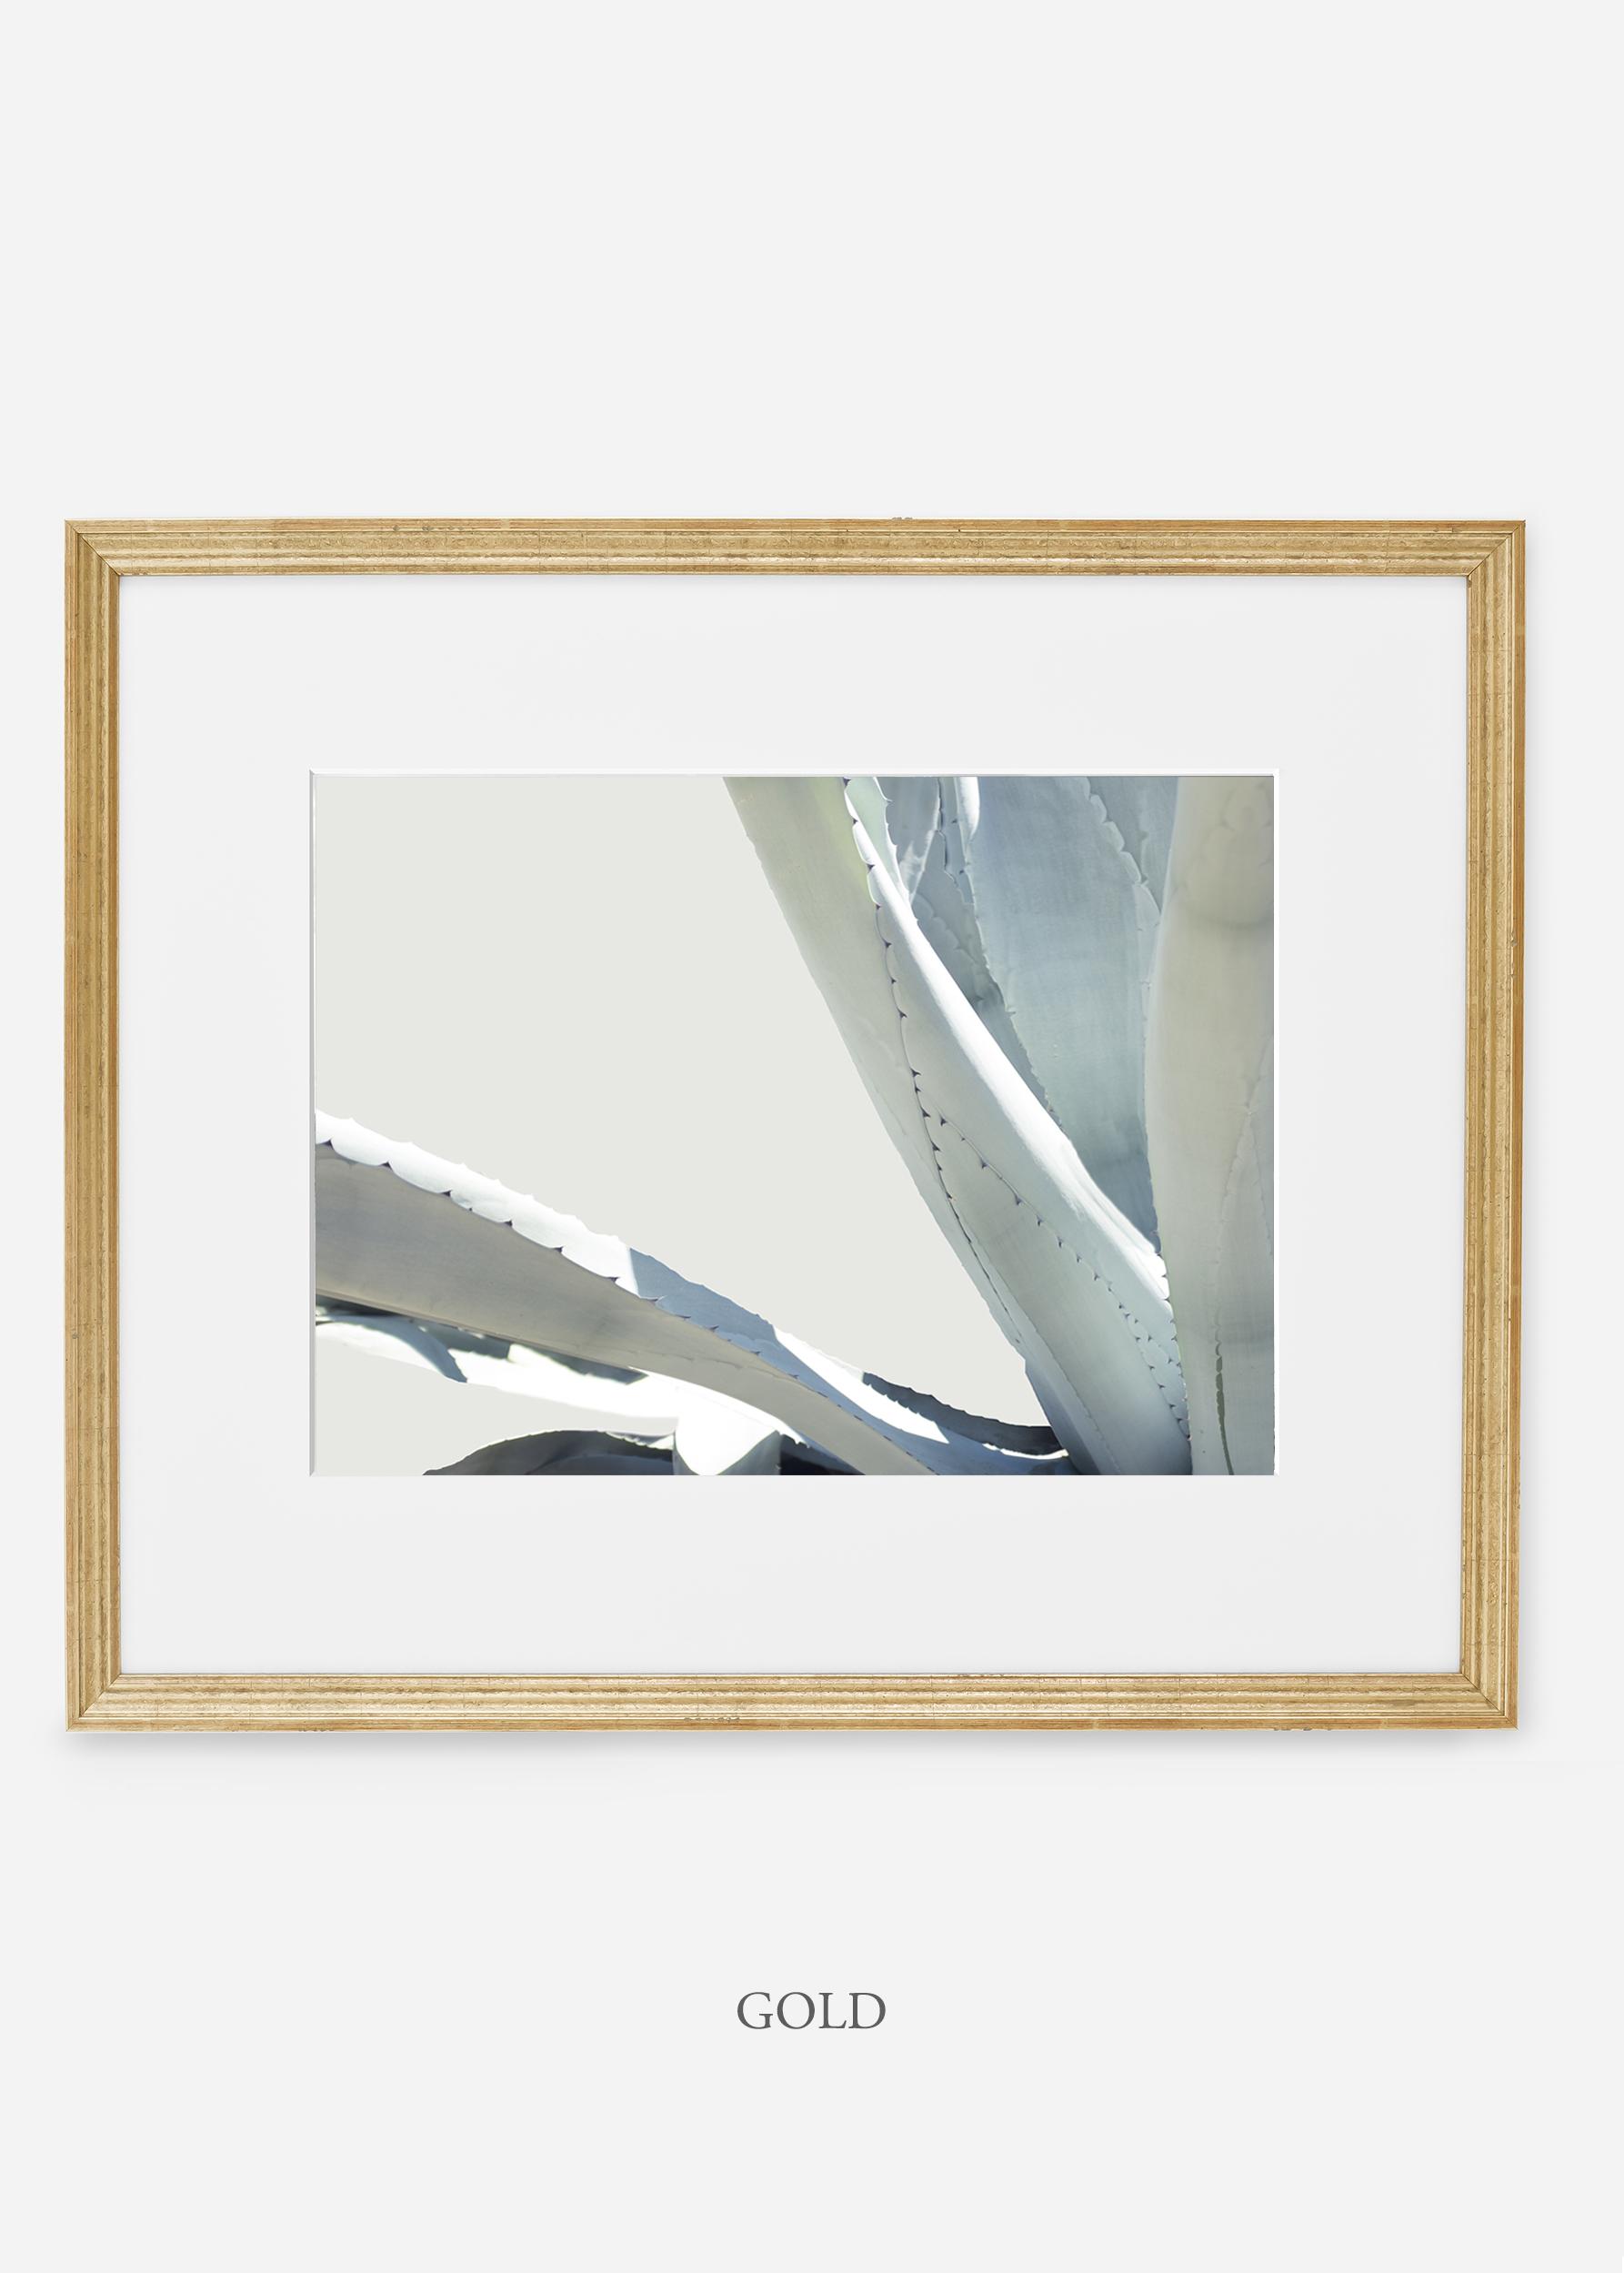 WilderCalifornia_goldframe_WinterWhite_No6_Art_Photography_interiordesign_agave.jpg